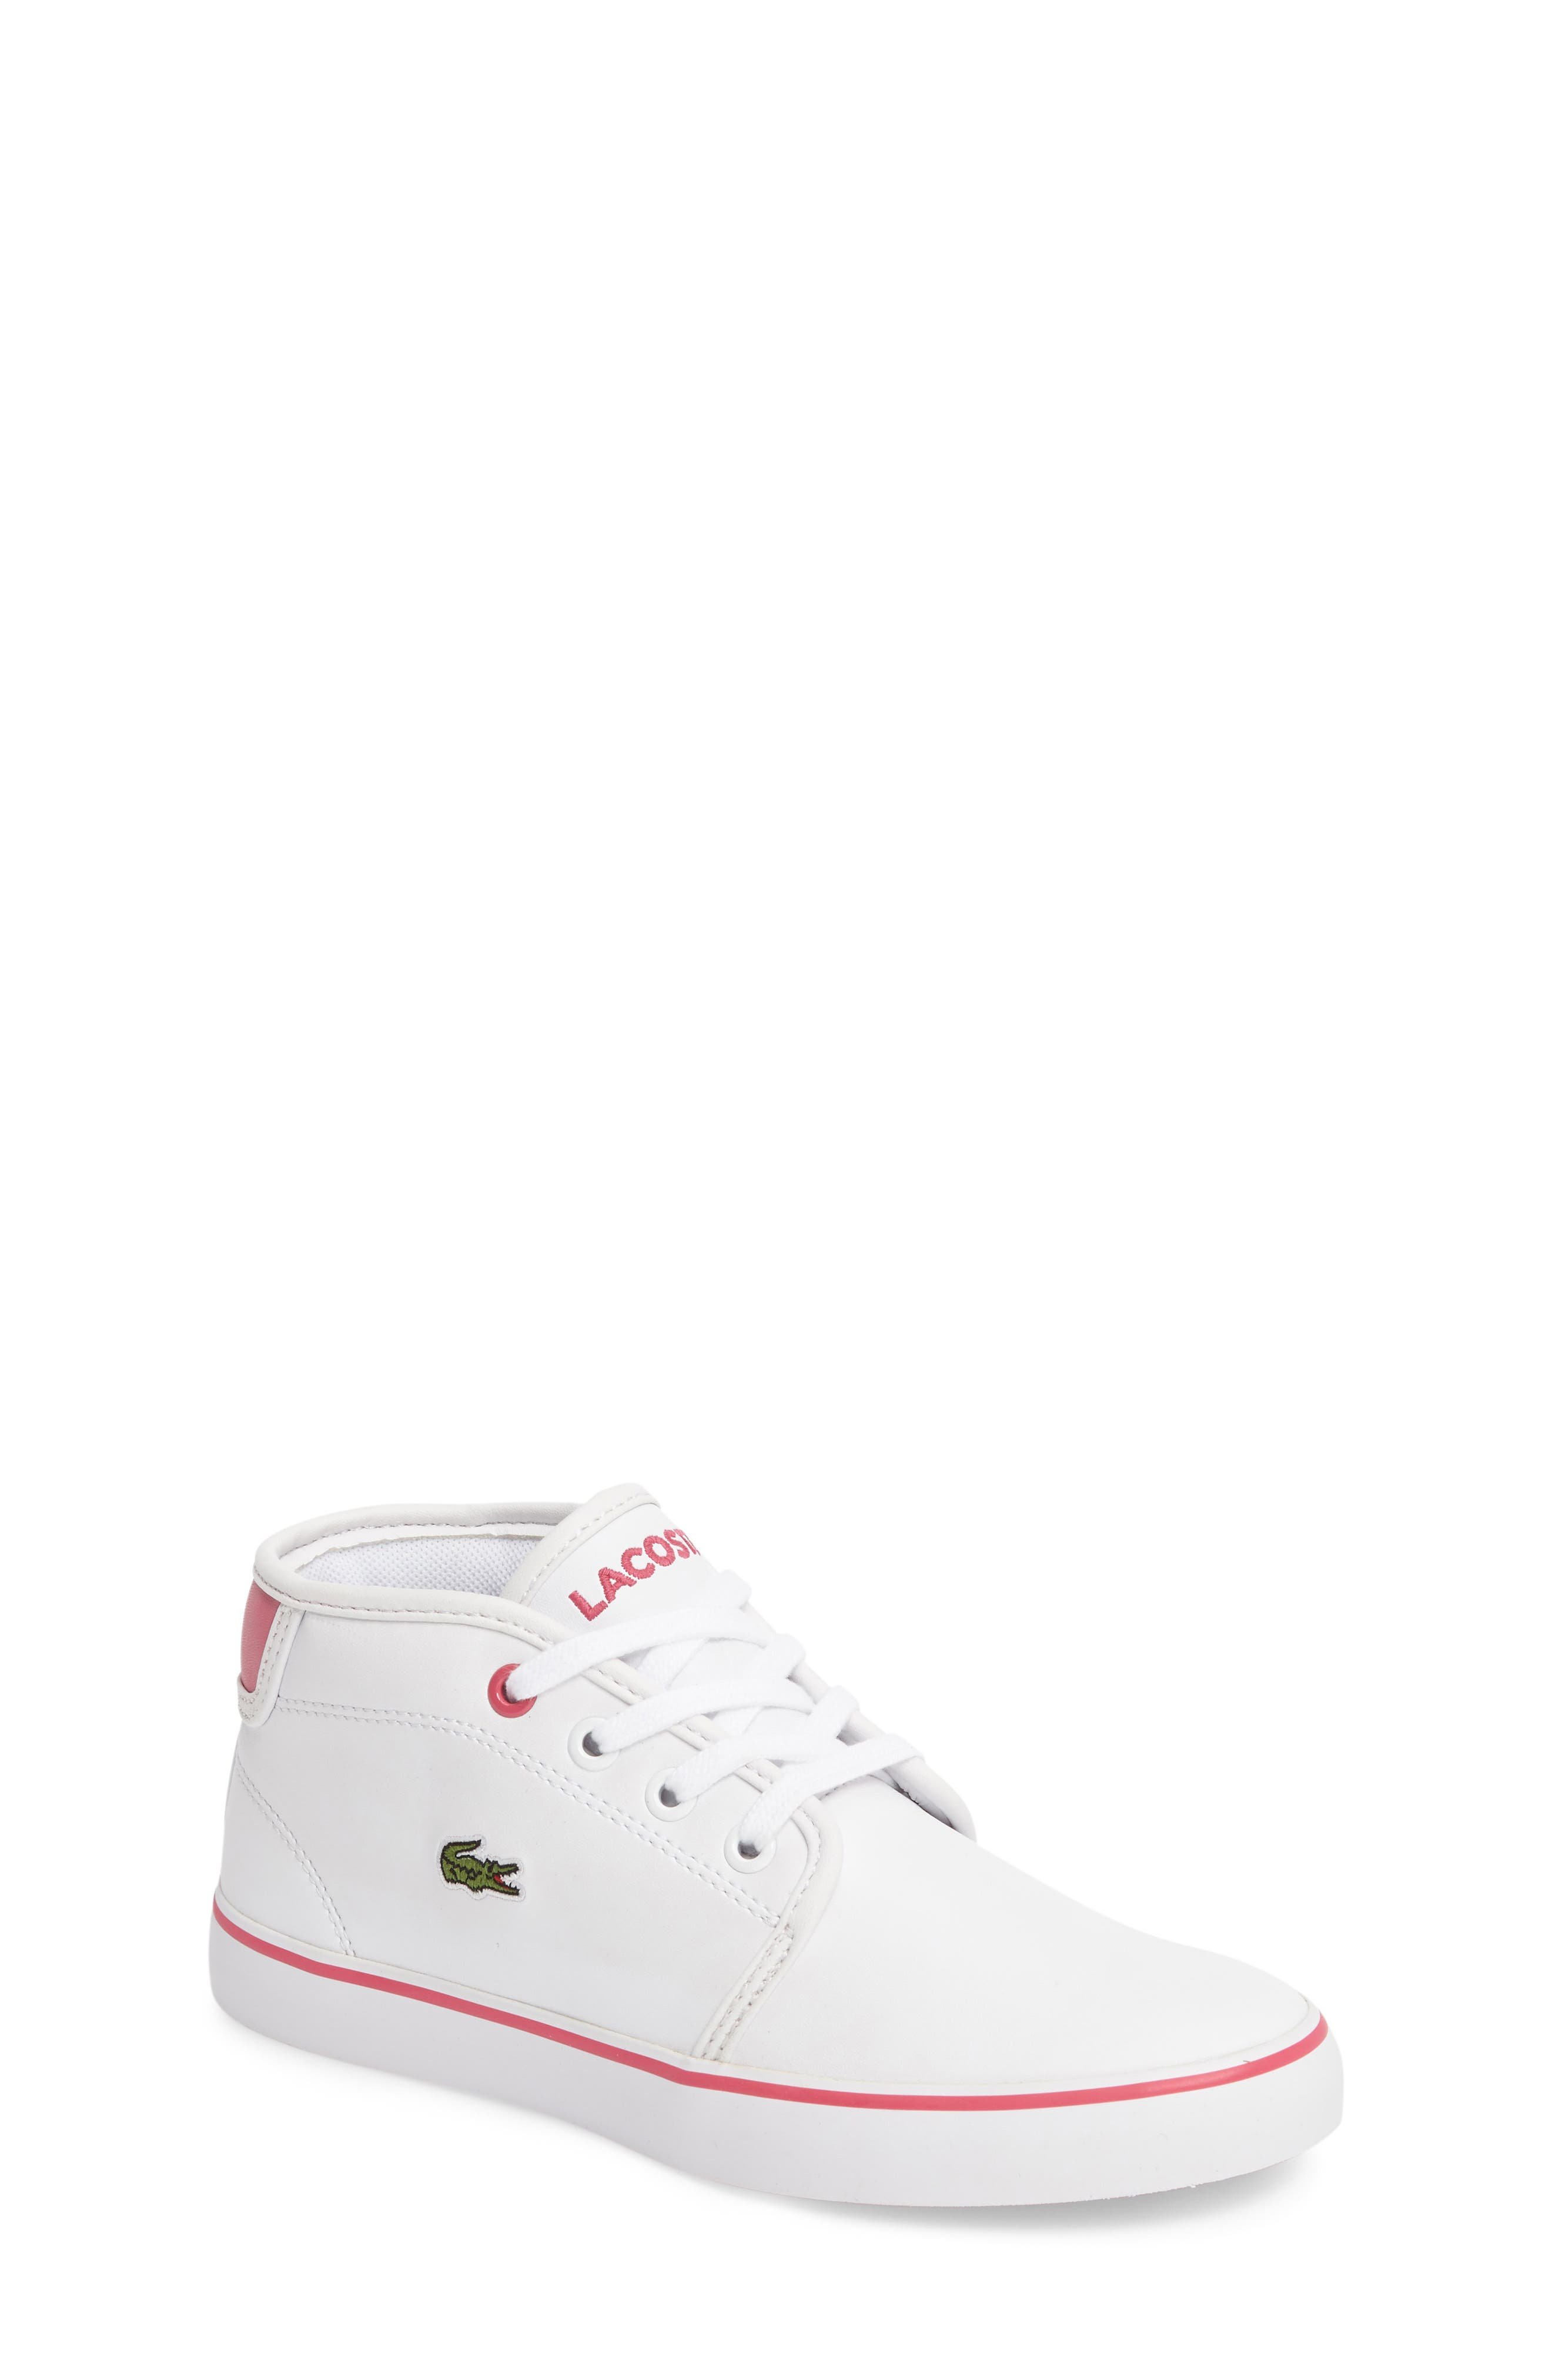 Lacoste Ampthill Mid-Top Sneaker (Baby, Walker, Toddler & Little Kid)